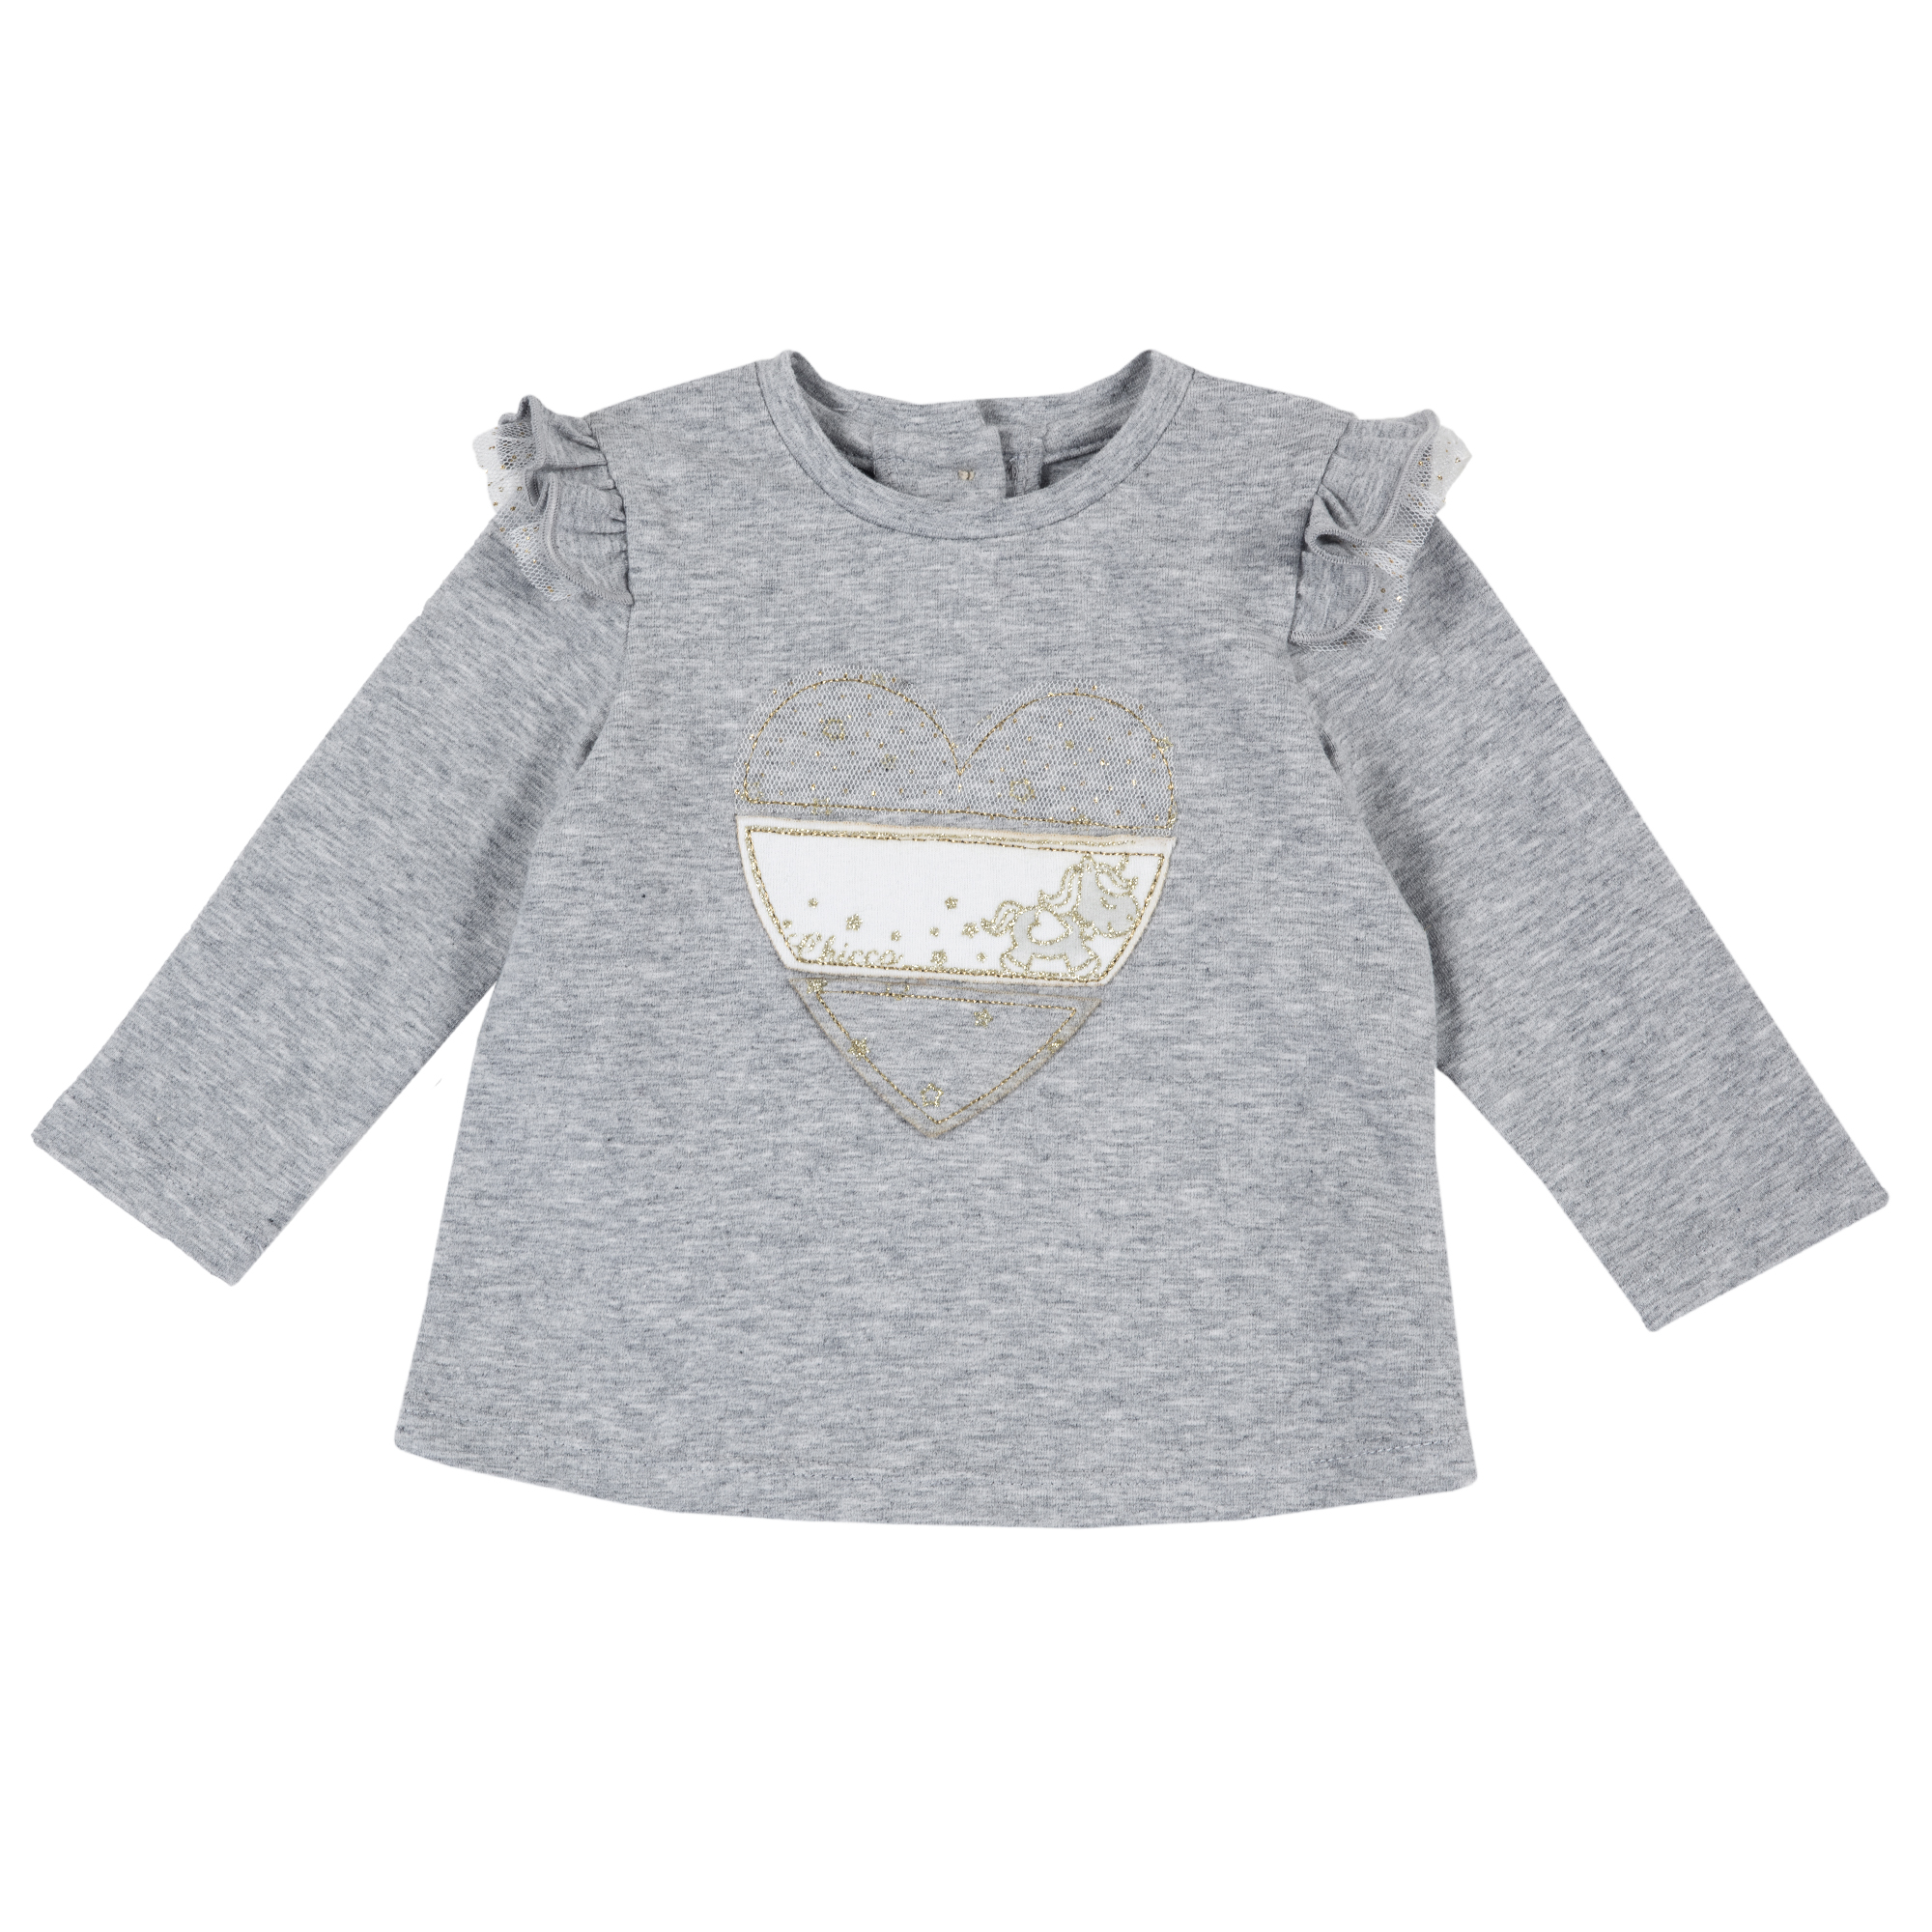 Bluza Copii Chicco, Maneca Lunga, Gri Deschis, 06800 imagine